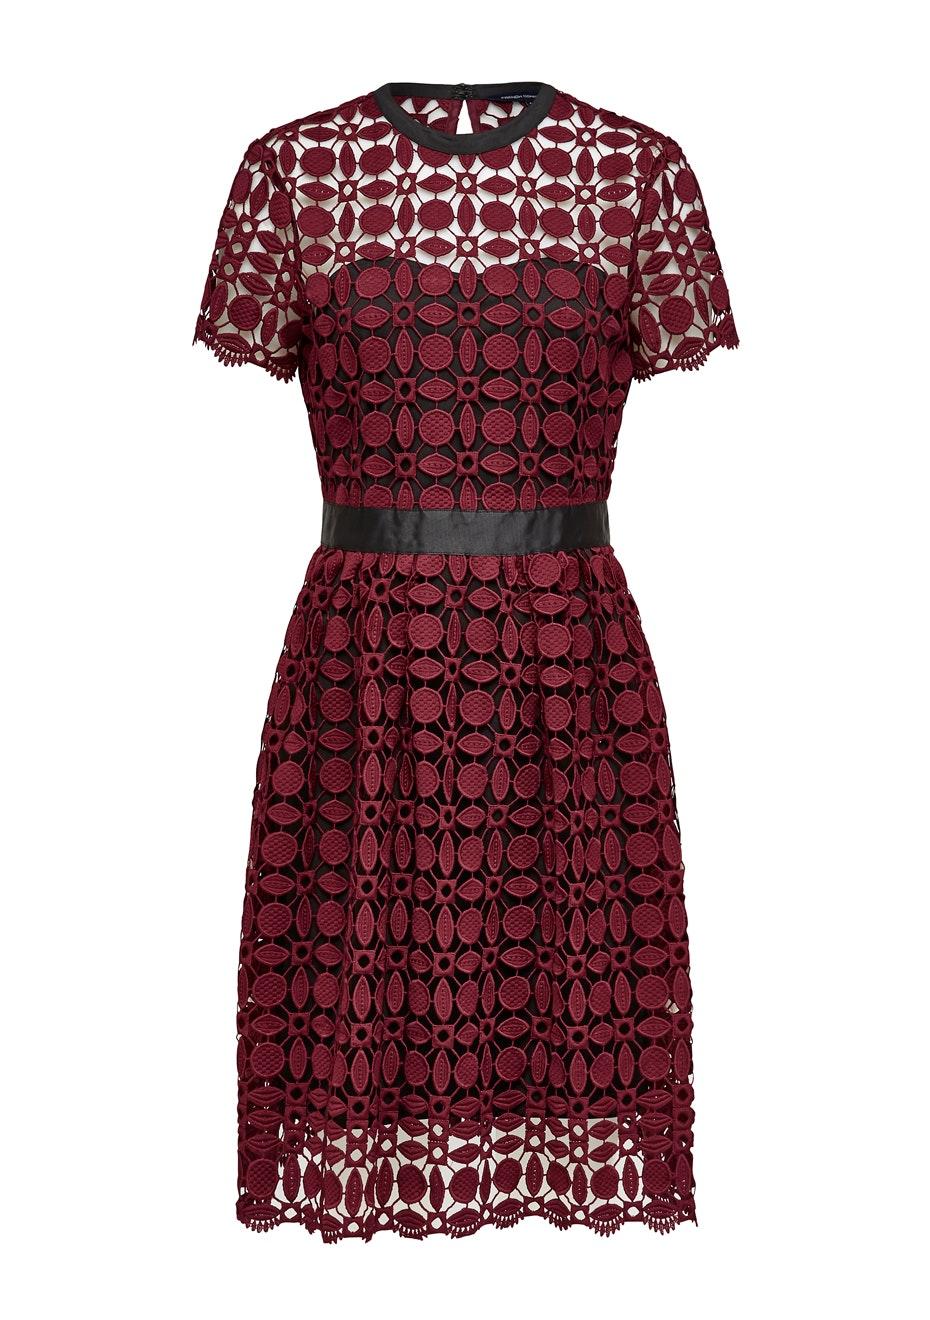 French Connection - Geo Lace Midi Dress - Bordeaux